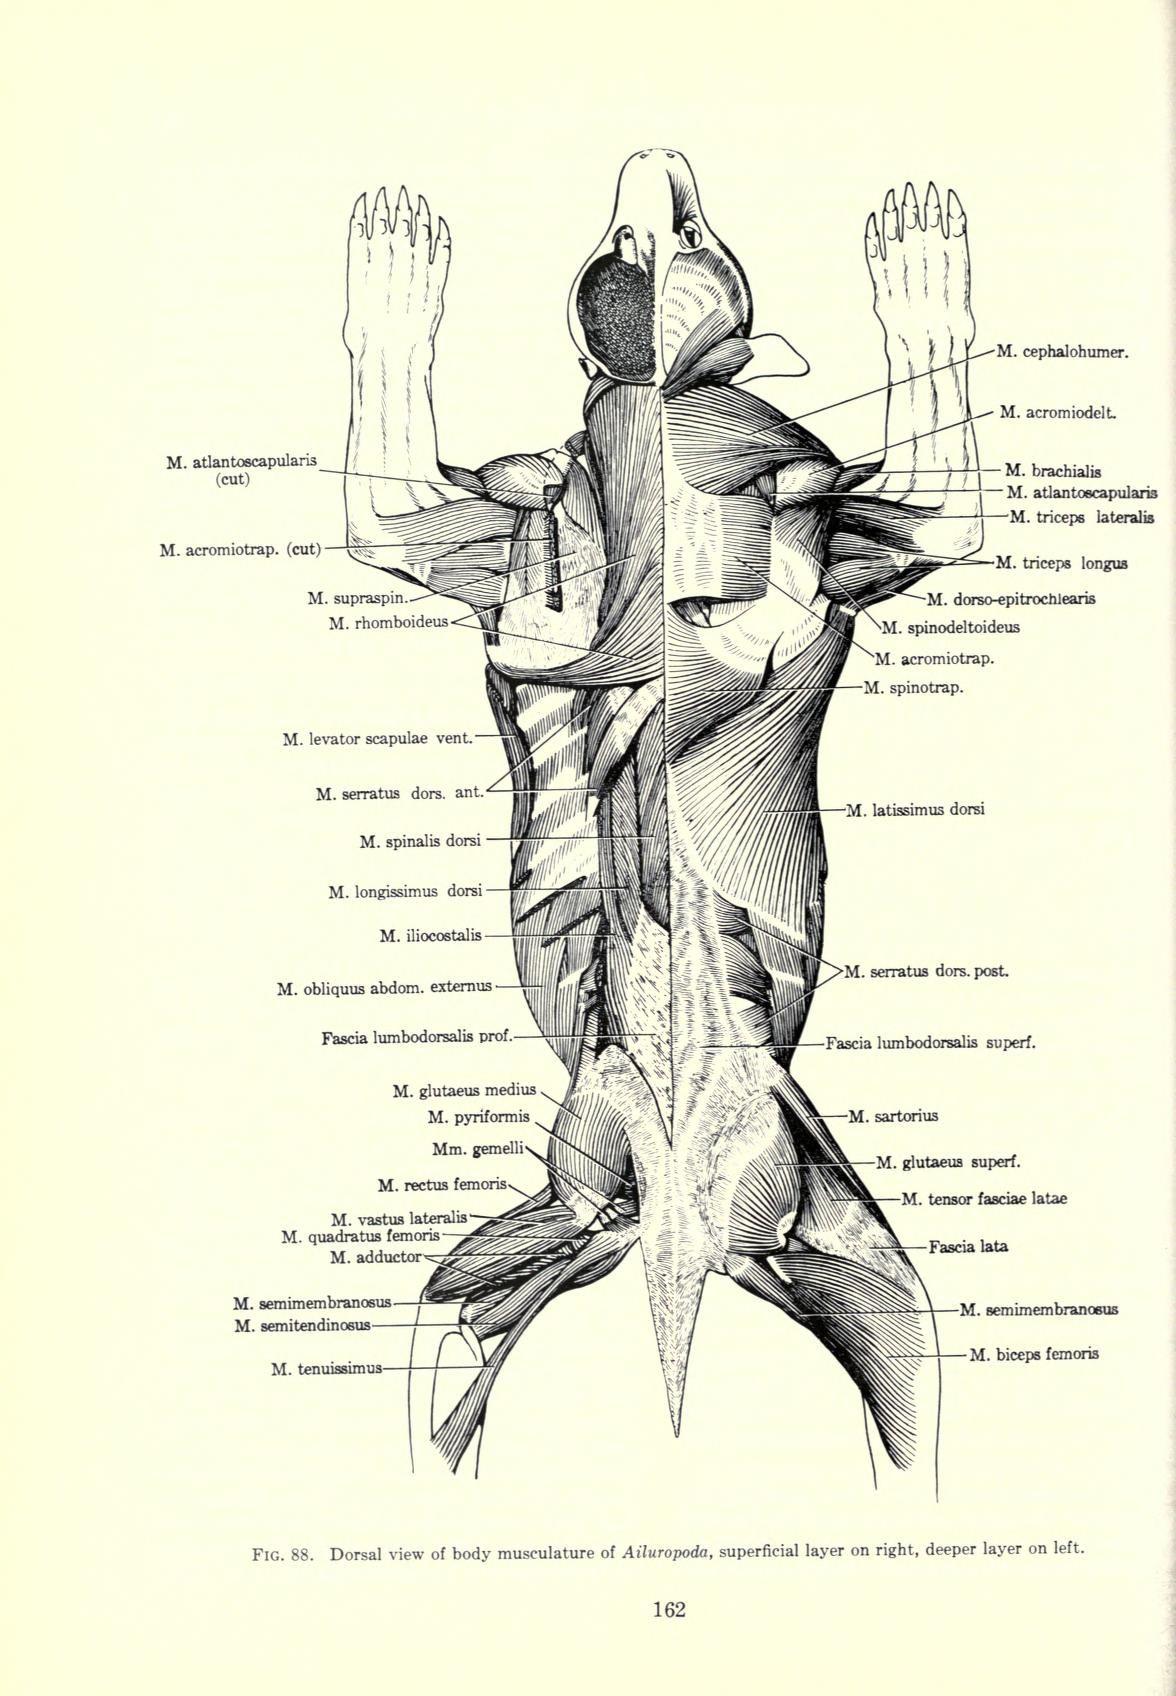 diagram of giant panda body wiring diagram tutorial Opossum Body Diagram giant panda anatomy animal anatomy ref panda, anatomy, illustrationgiant panda anatomy